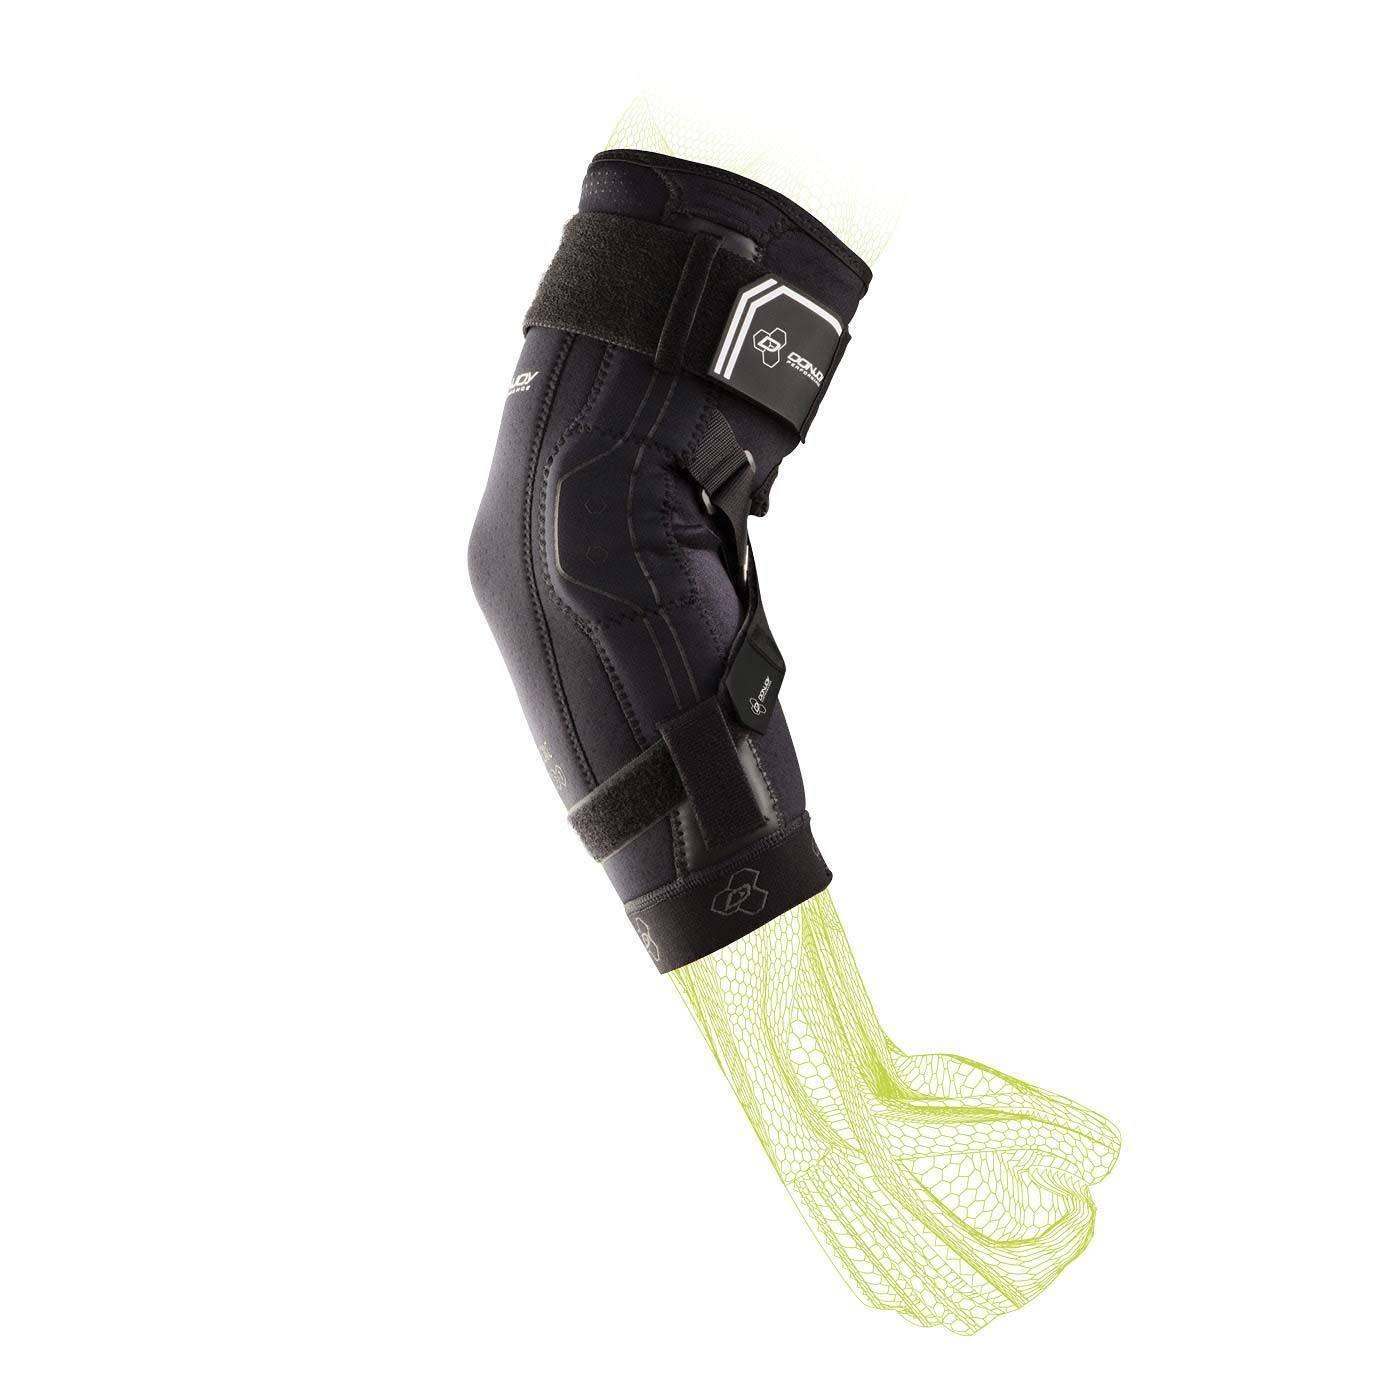 Bionic™ Elbow Brace II - Medium